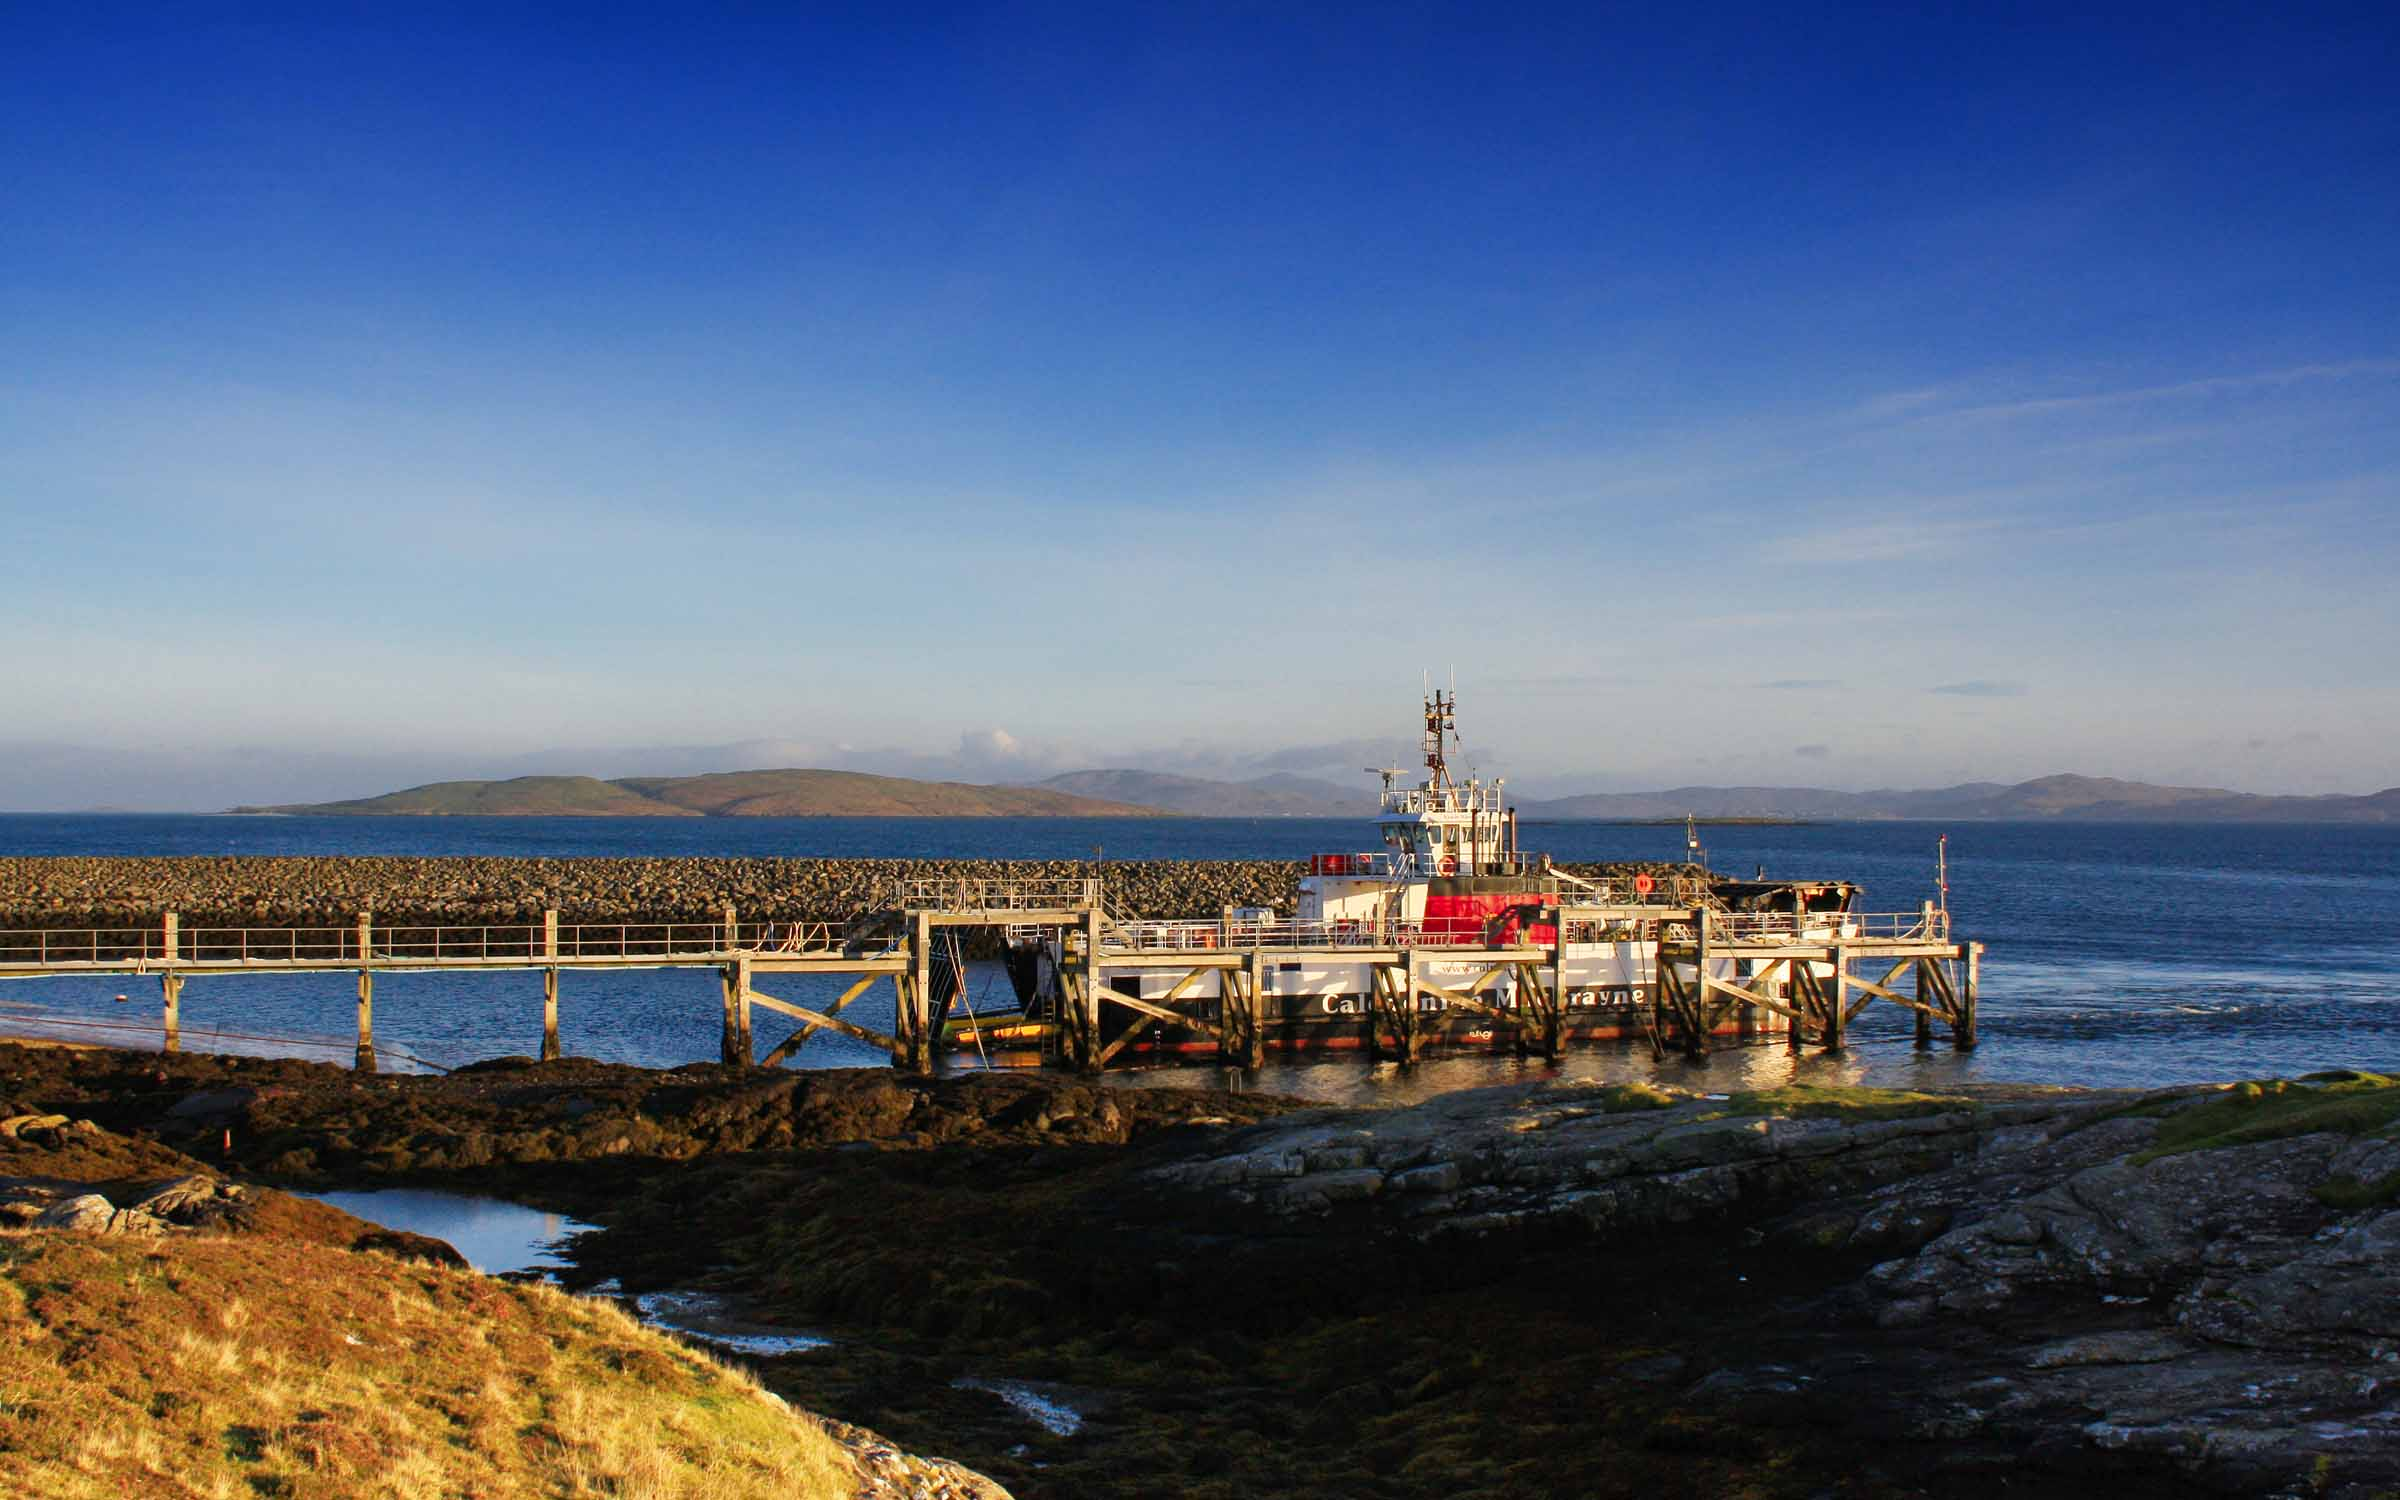 Loch Bhrusda at Ardmhor (Ships of CalMac)